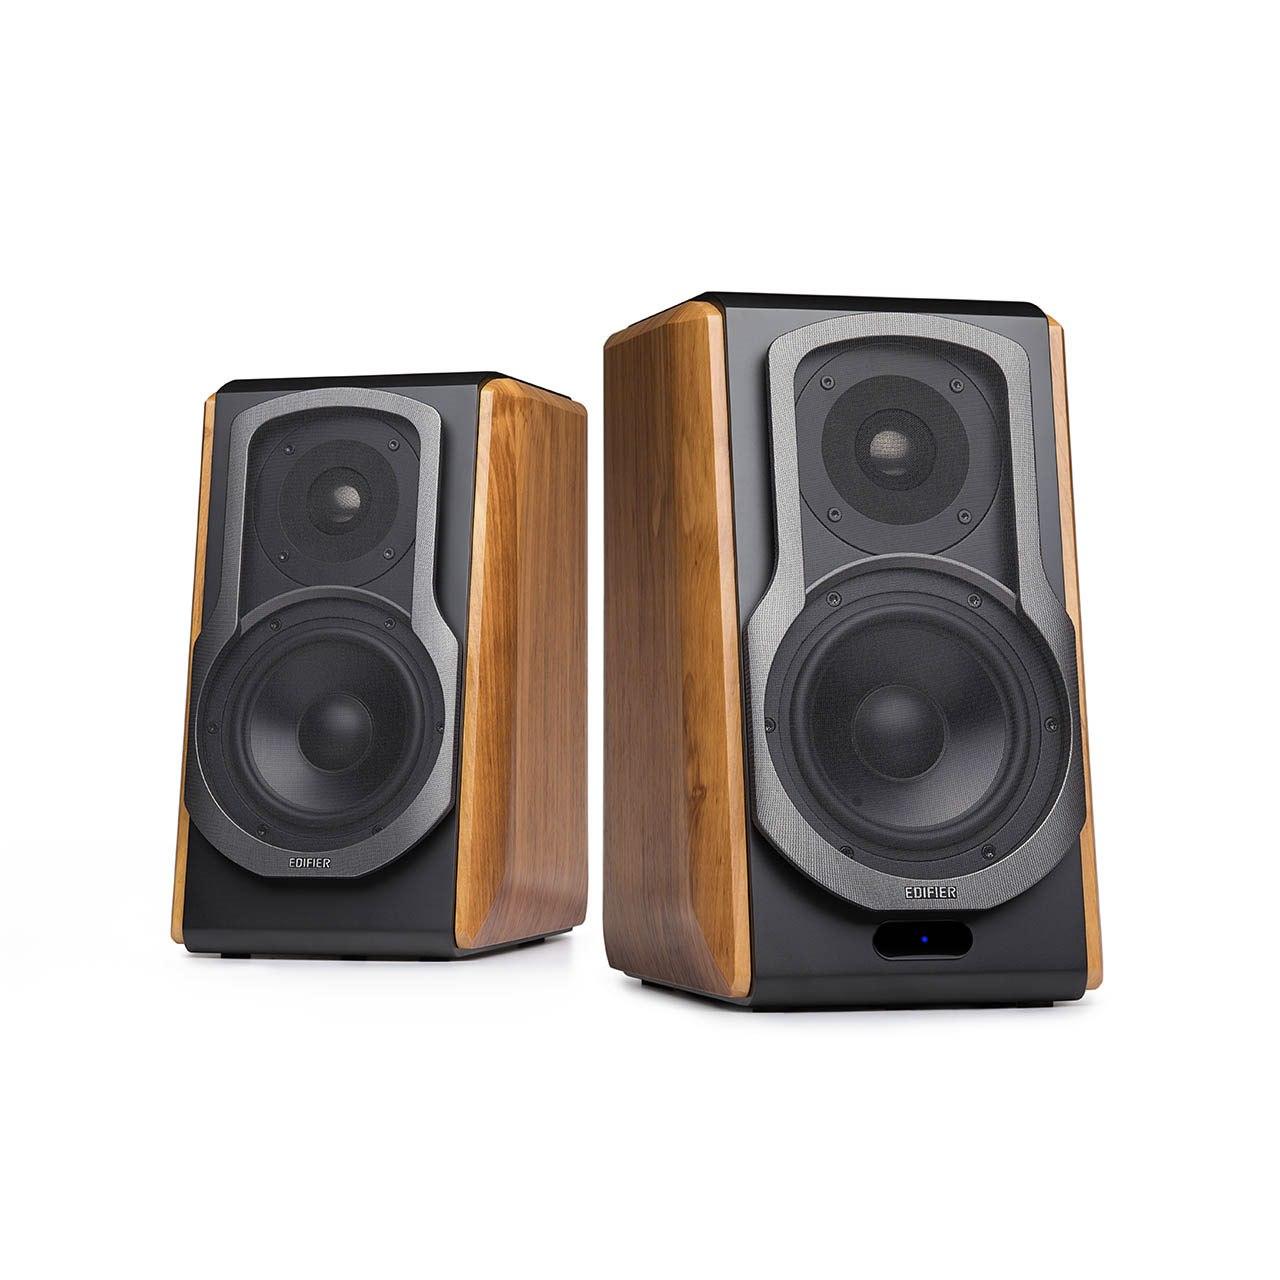 Edifier 'S1000DB' - 2.0 Lifestyle Studio Speakers, Bluetooth aptX